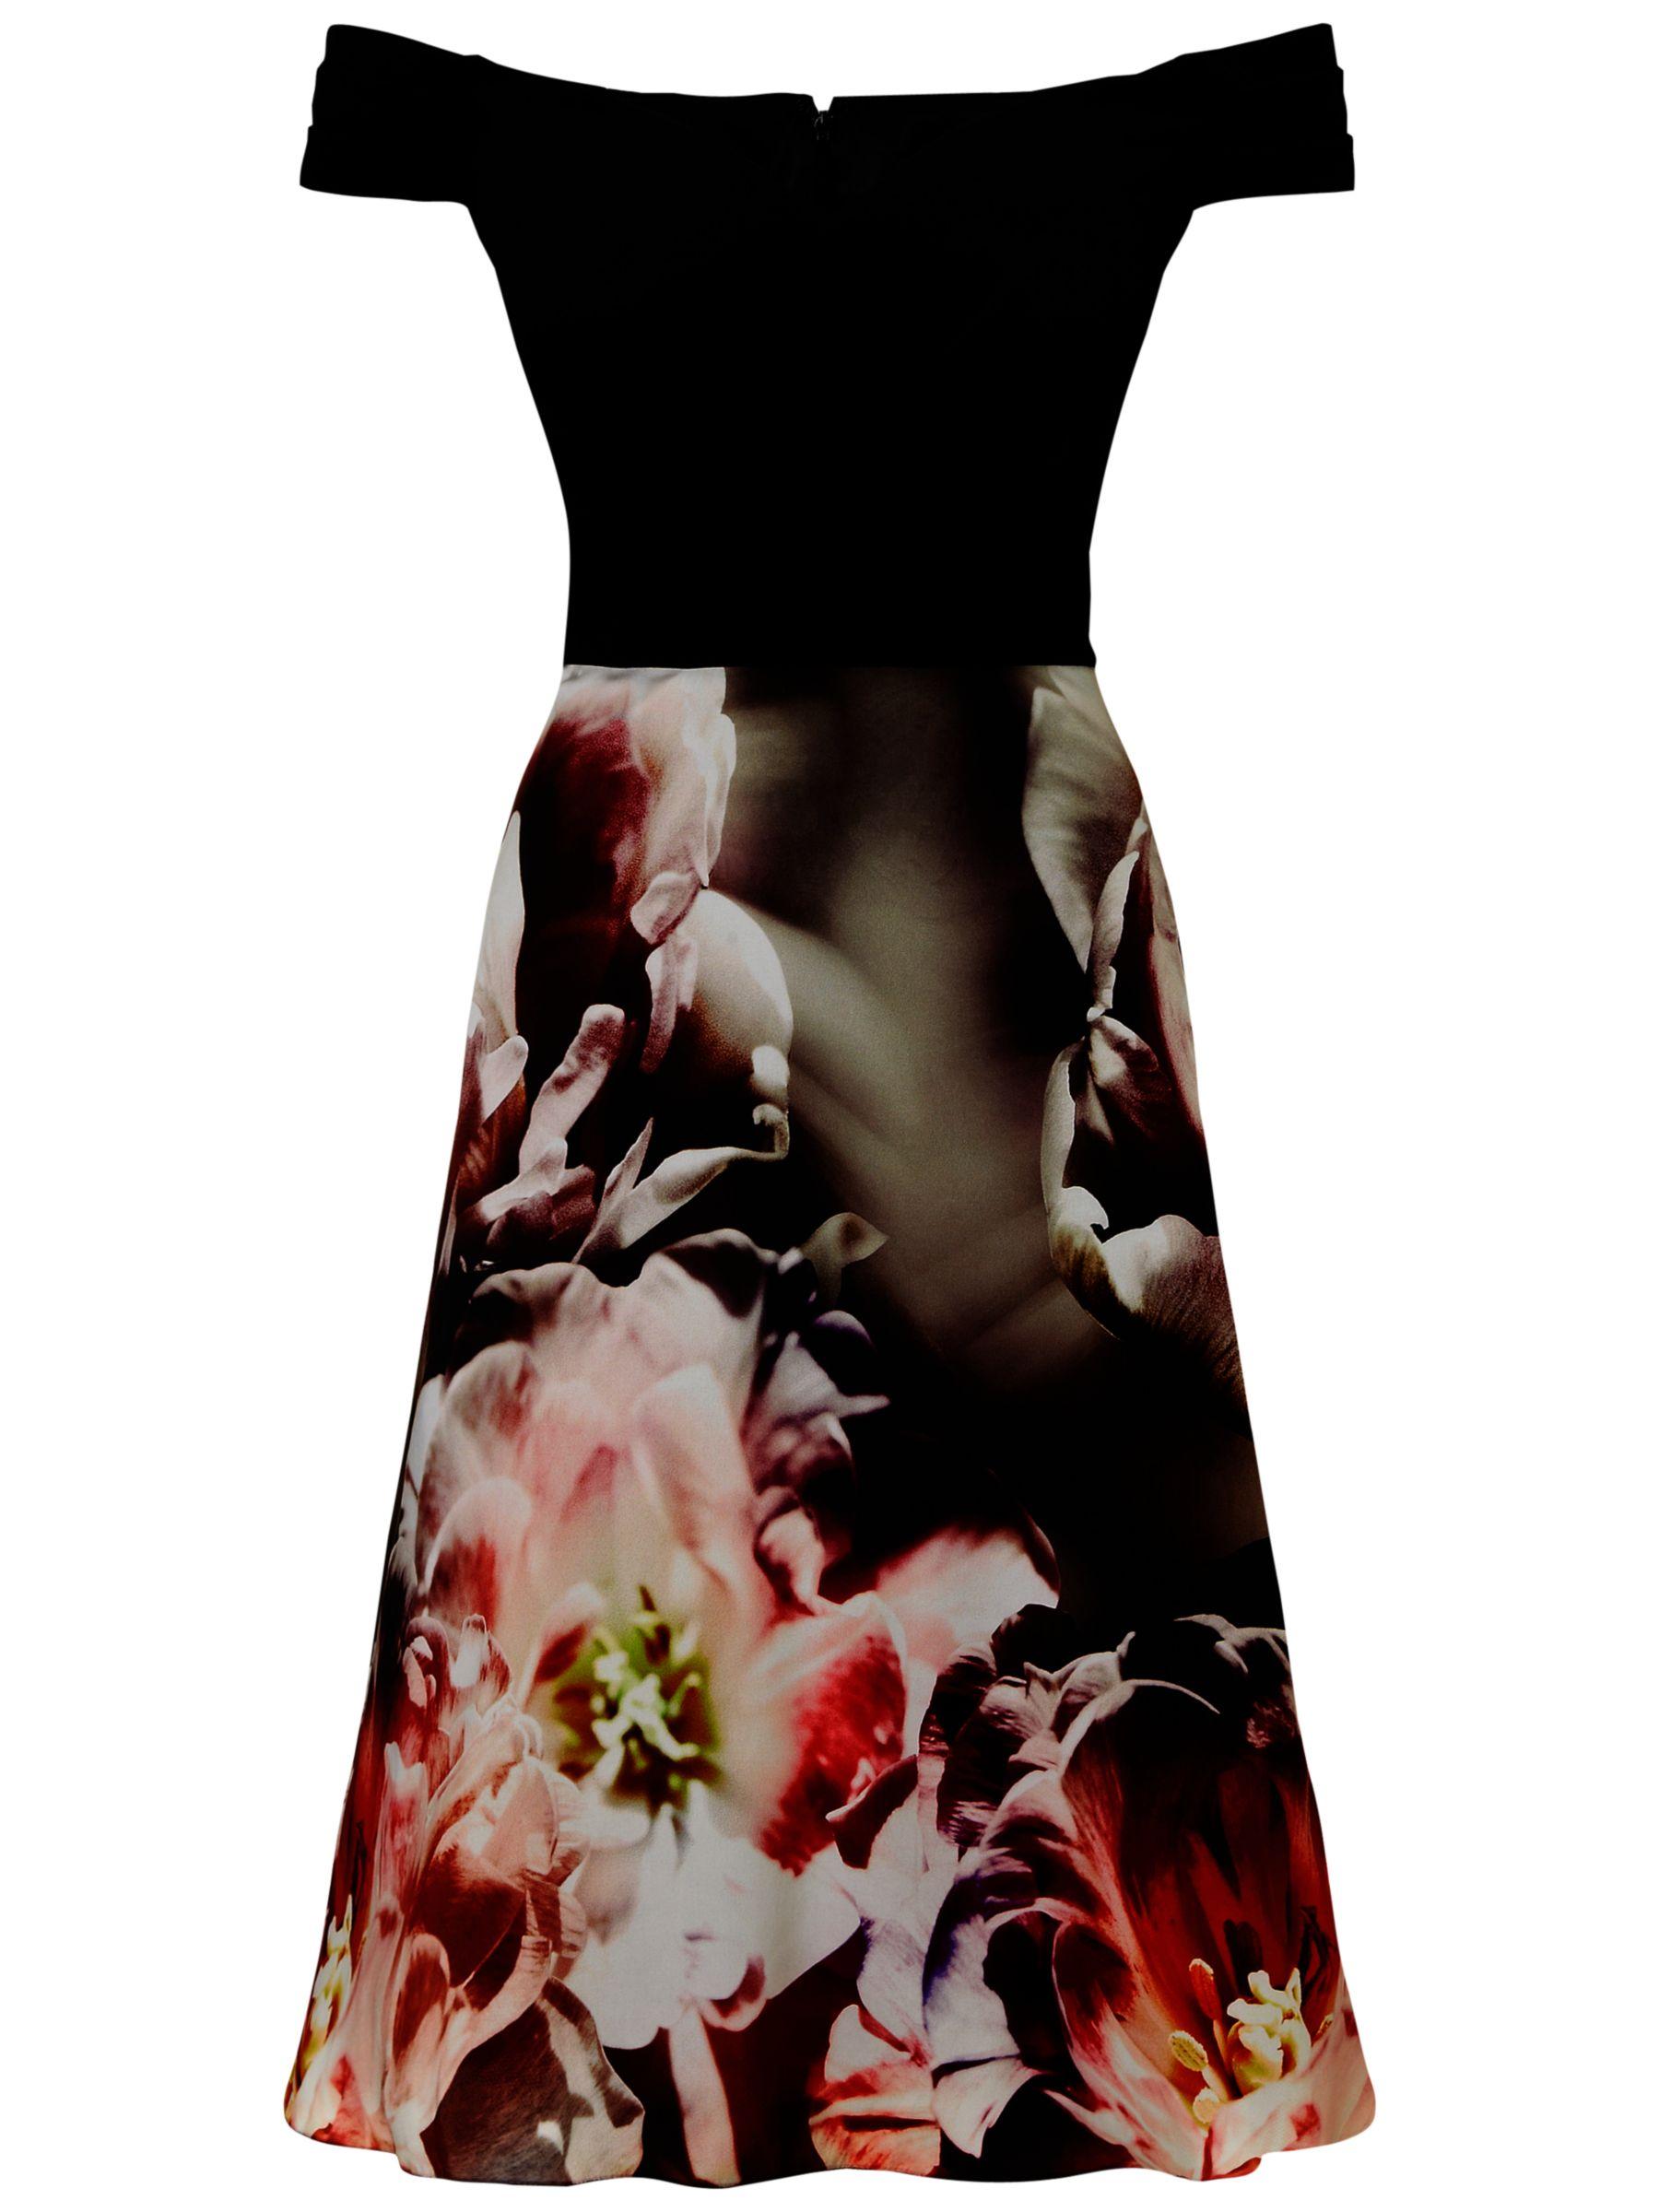 ariella paige prom short dress multi, ariella, paige, prom, short, dress, multi, 12|14|10|18|16|8, clearance, womenswear offers, womens dresses offers, women, plus size, inactive womenswear, new reductions, womens dresses, special offers, 1623138